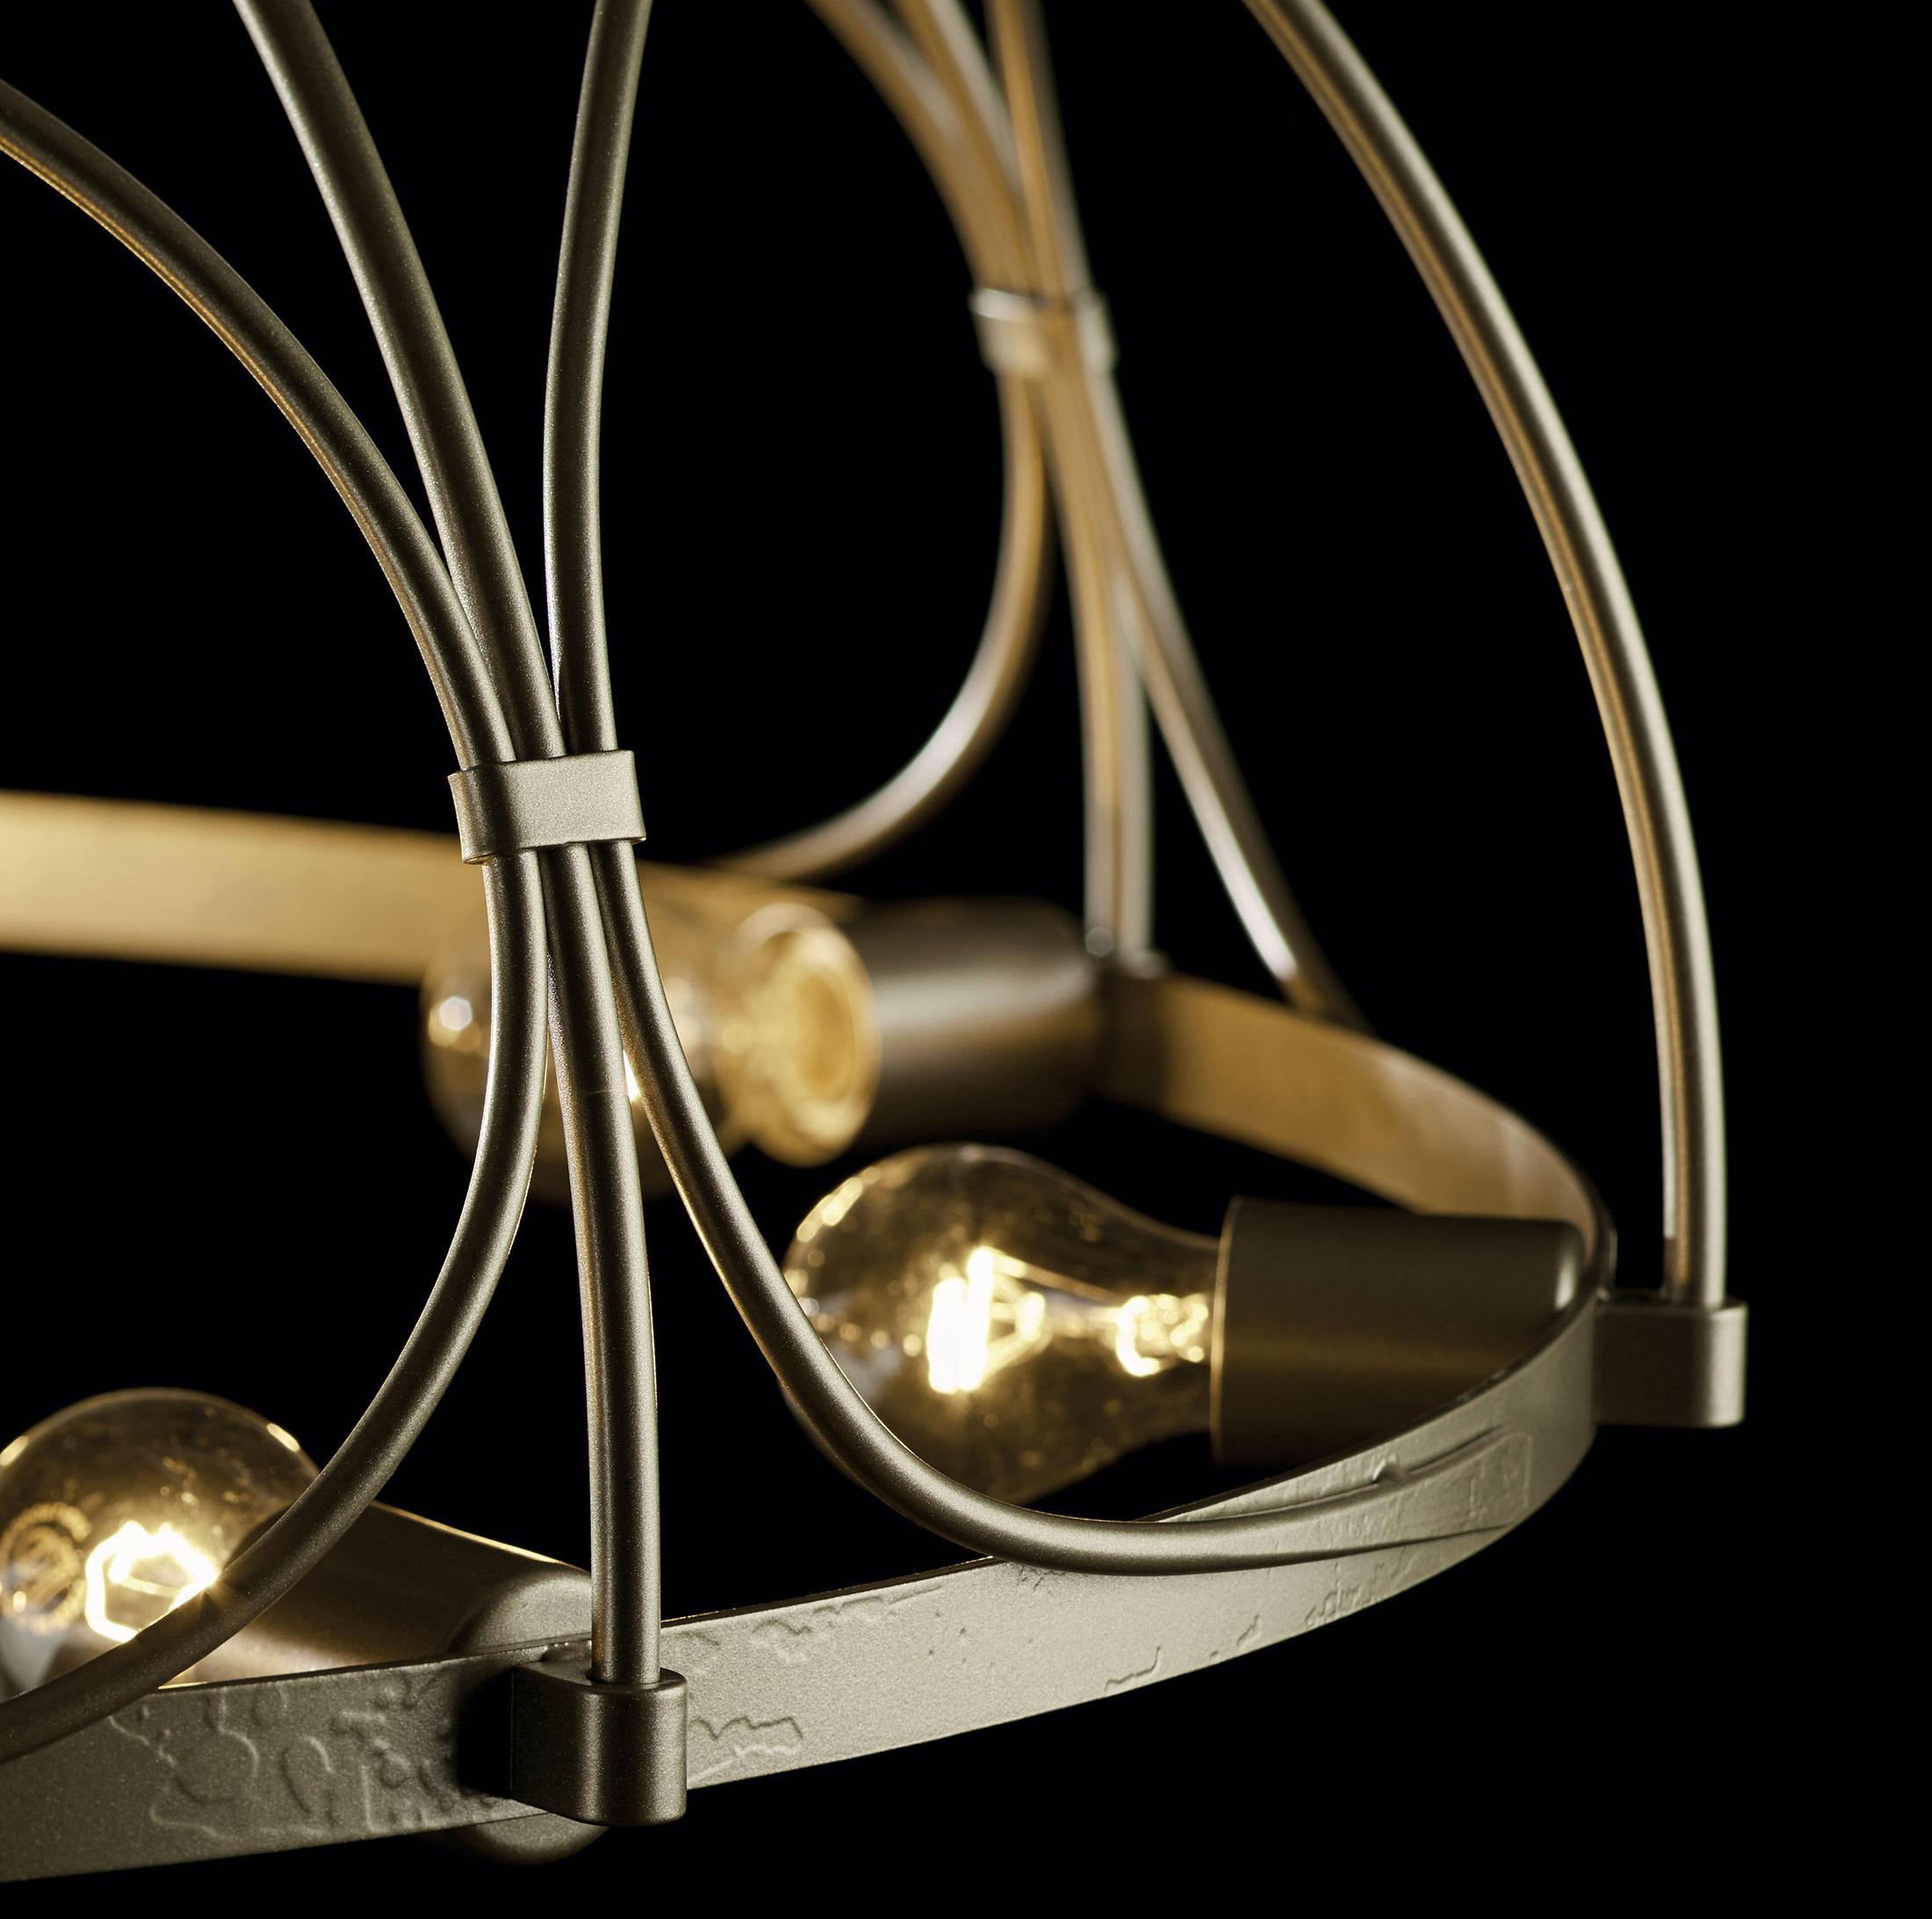 Arbor chandelier chandeliers from hubbardton forge architonic arbor chandelier by hubbardton forge aloadofball Choice Image